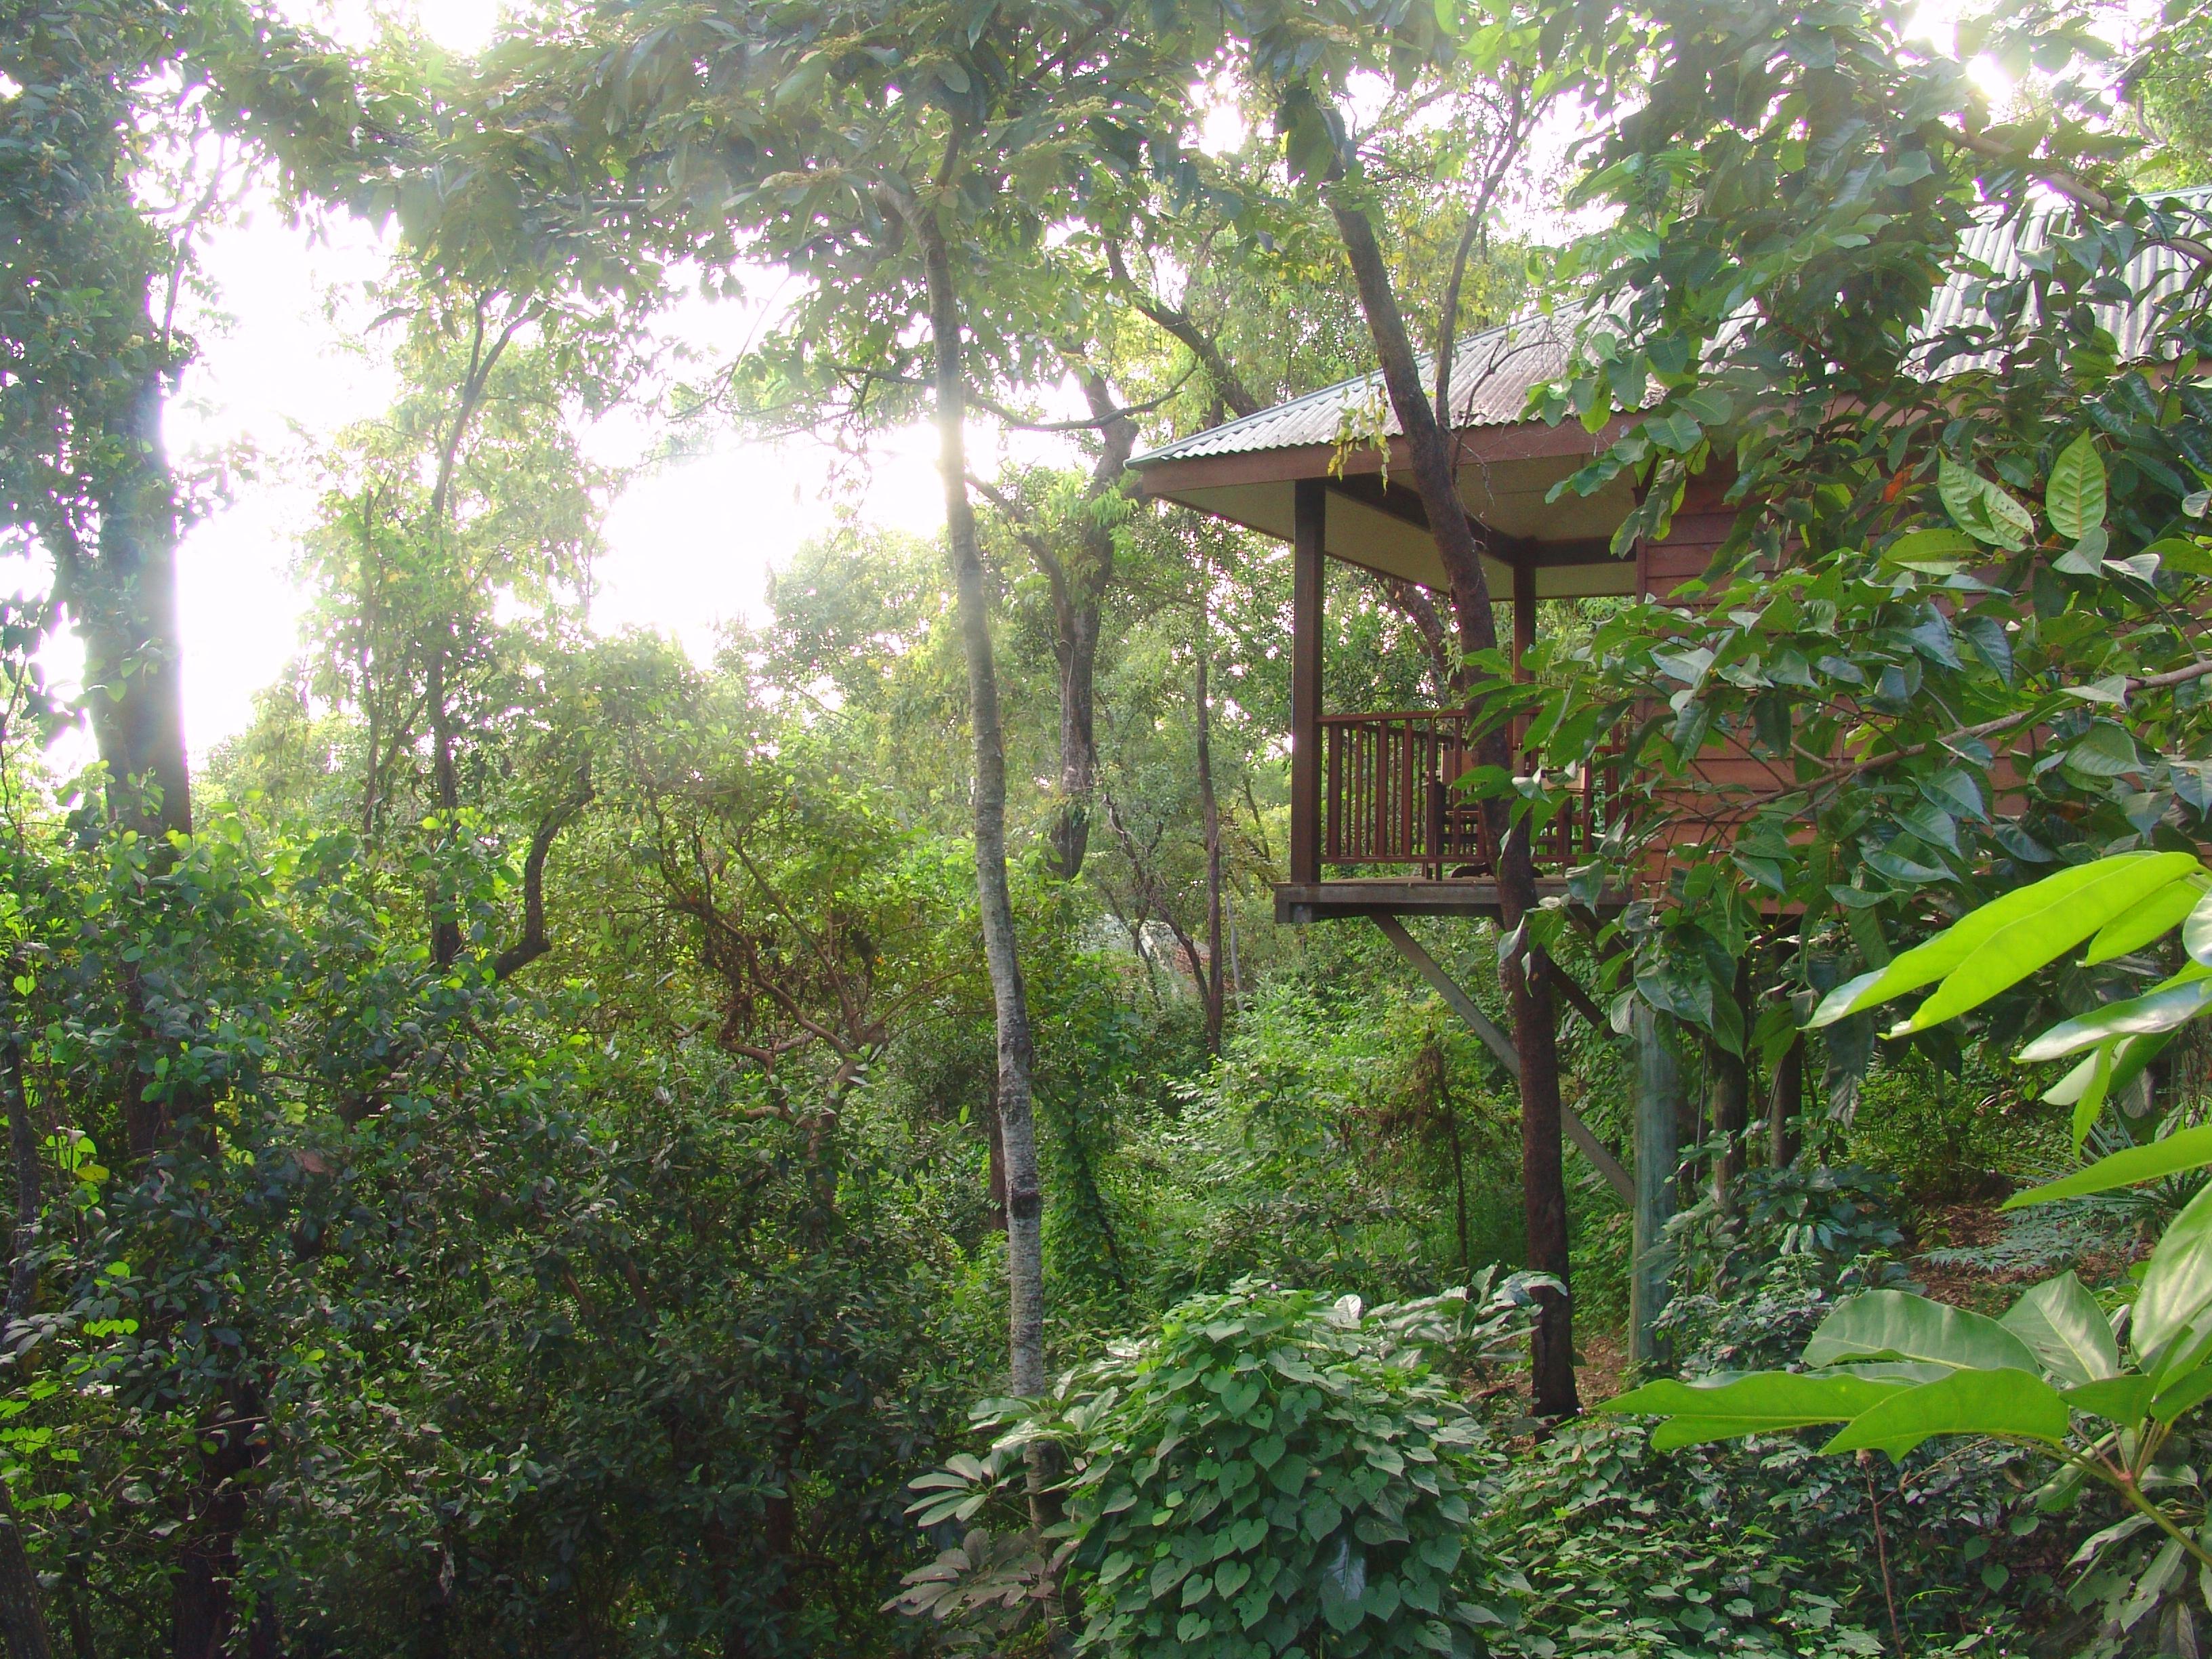 http://www.thalabeach.com.au/wp-content/uploads/2010/07/Thala-eucalypt-bungalow-forest-canopy.jpg